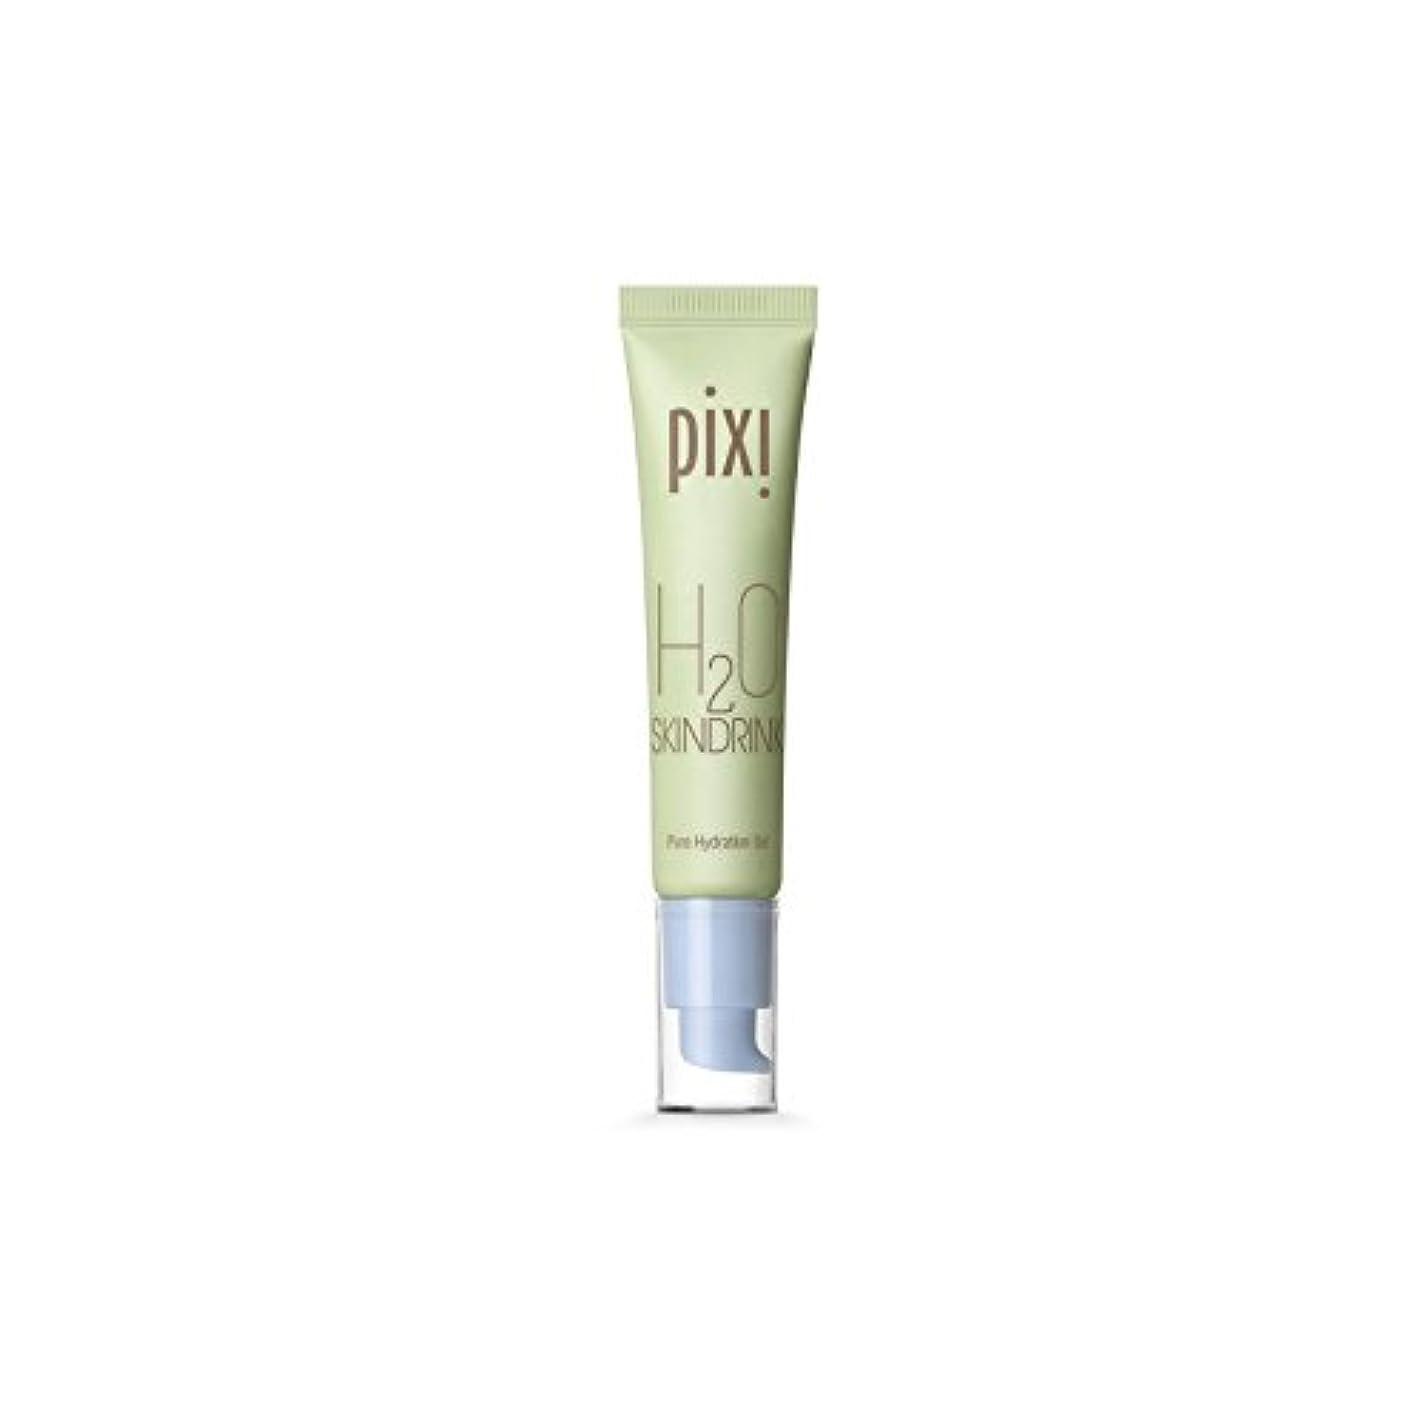 Pixi H20 Skin Drink (Pack of 6) - 20スキンドリンク x6 [並行輸入品]